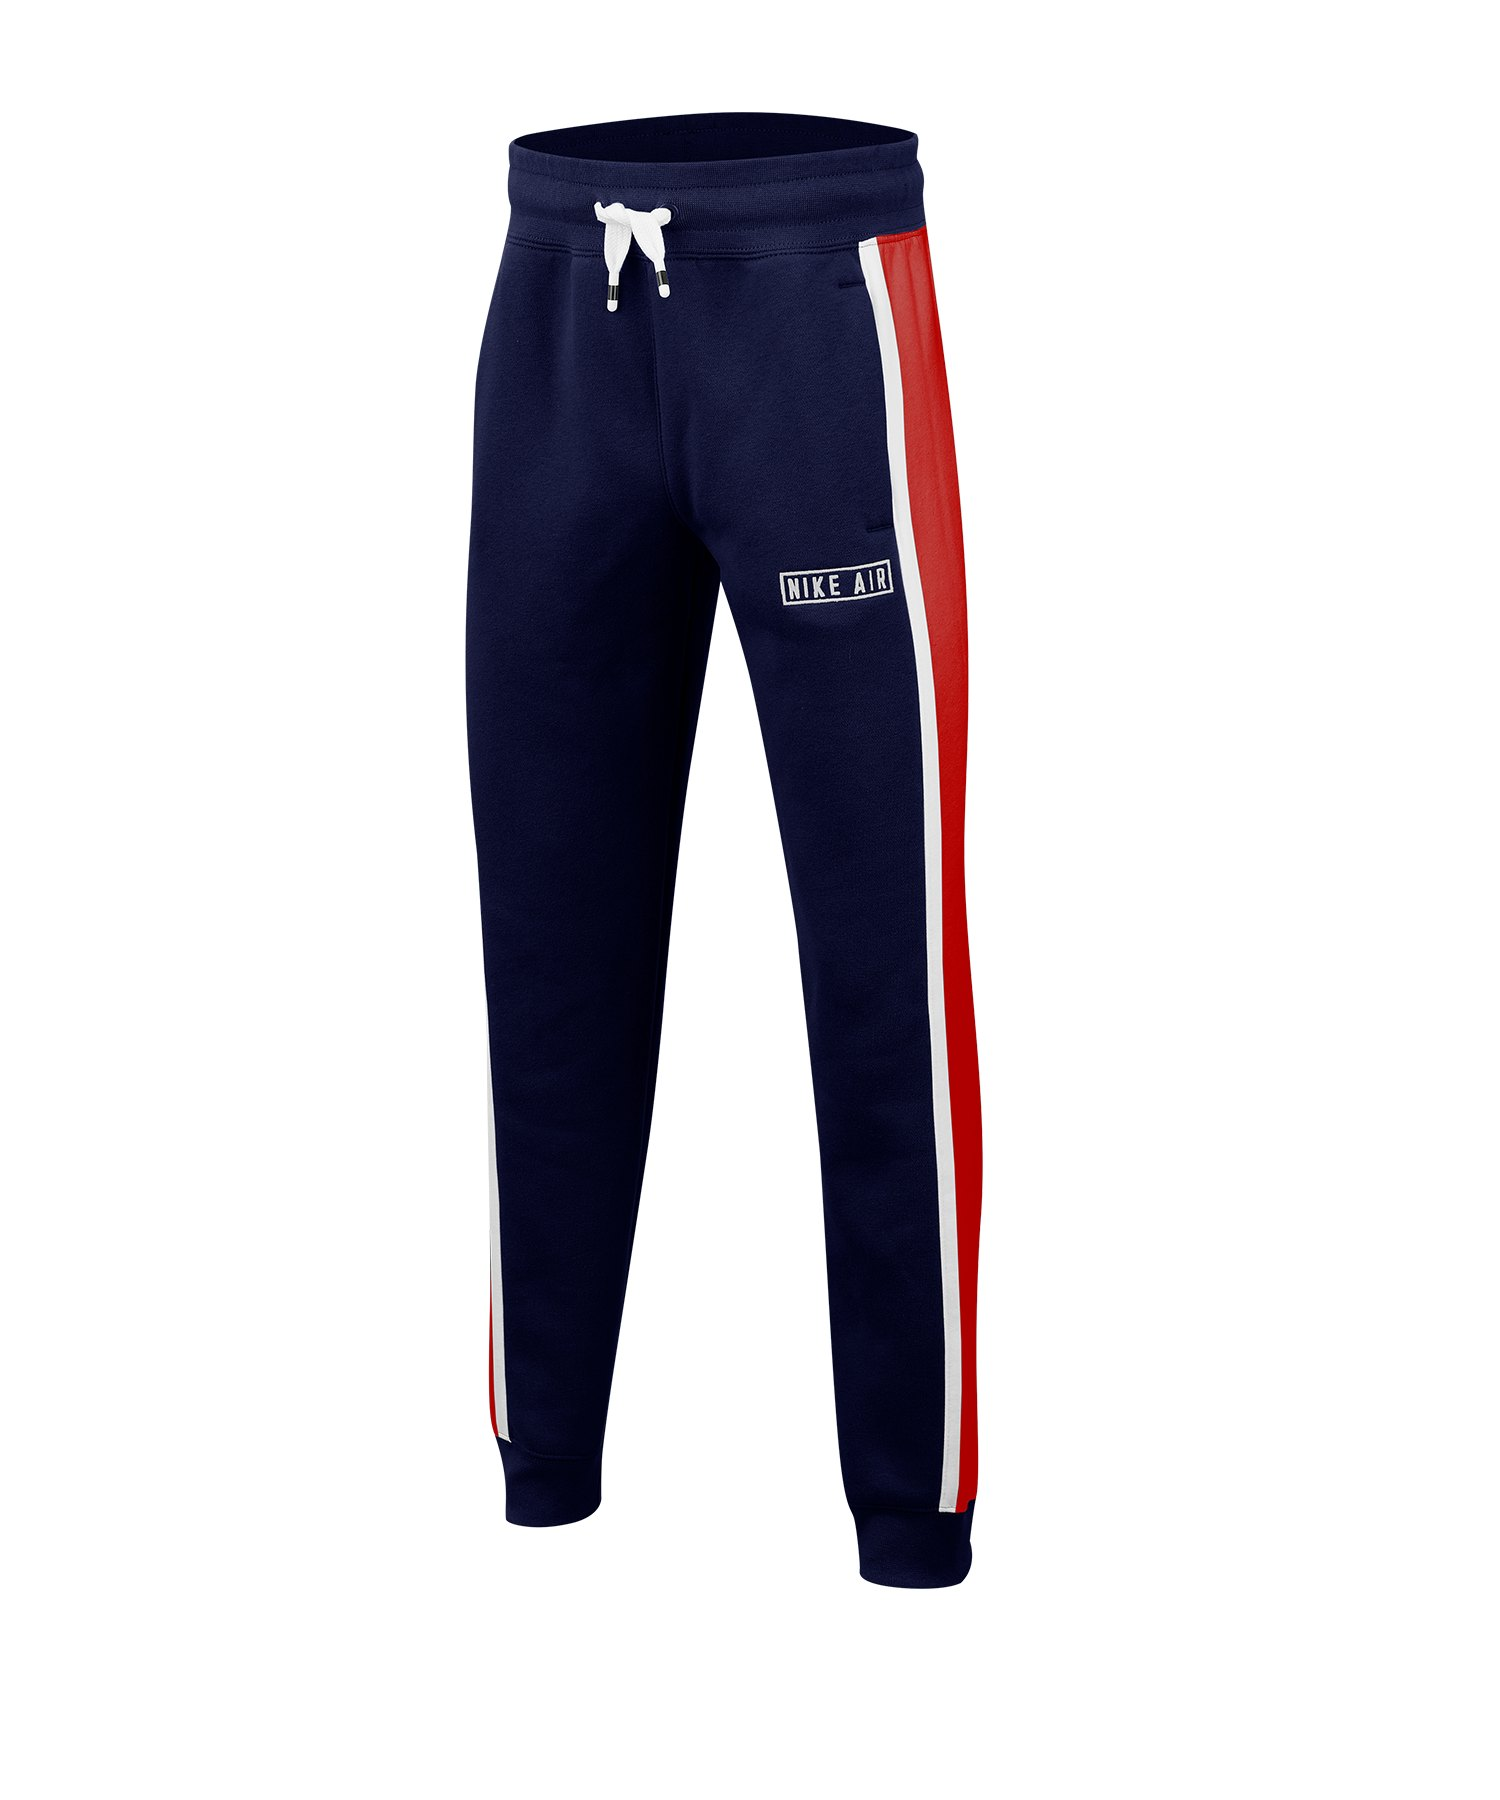 Nike Air Pant Jogginghose Kids Blau F492 - blau